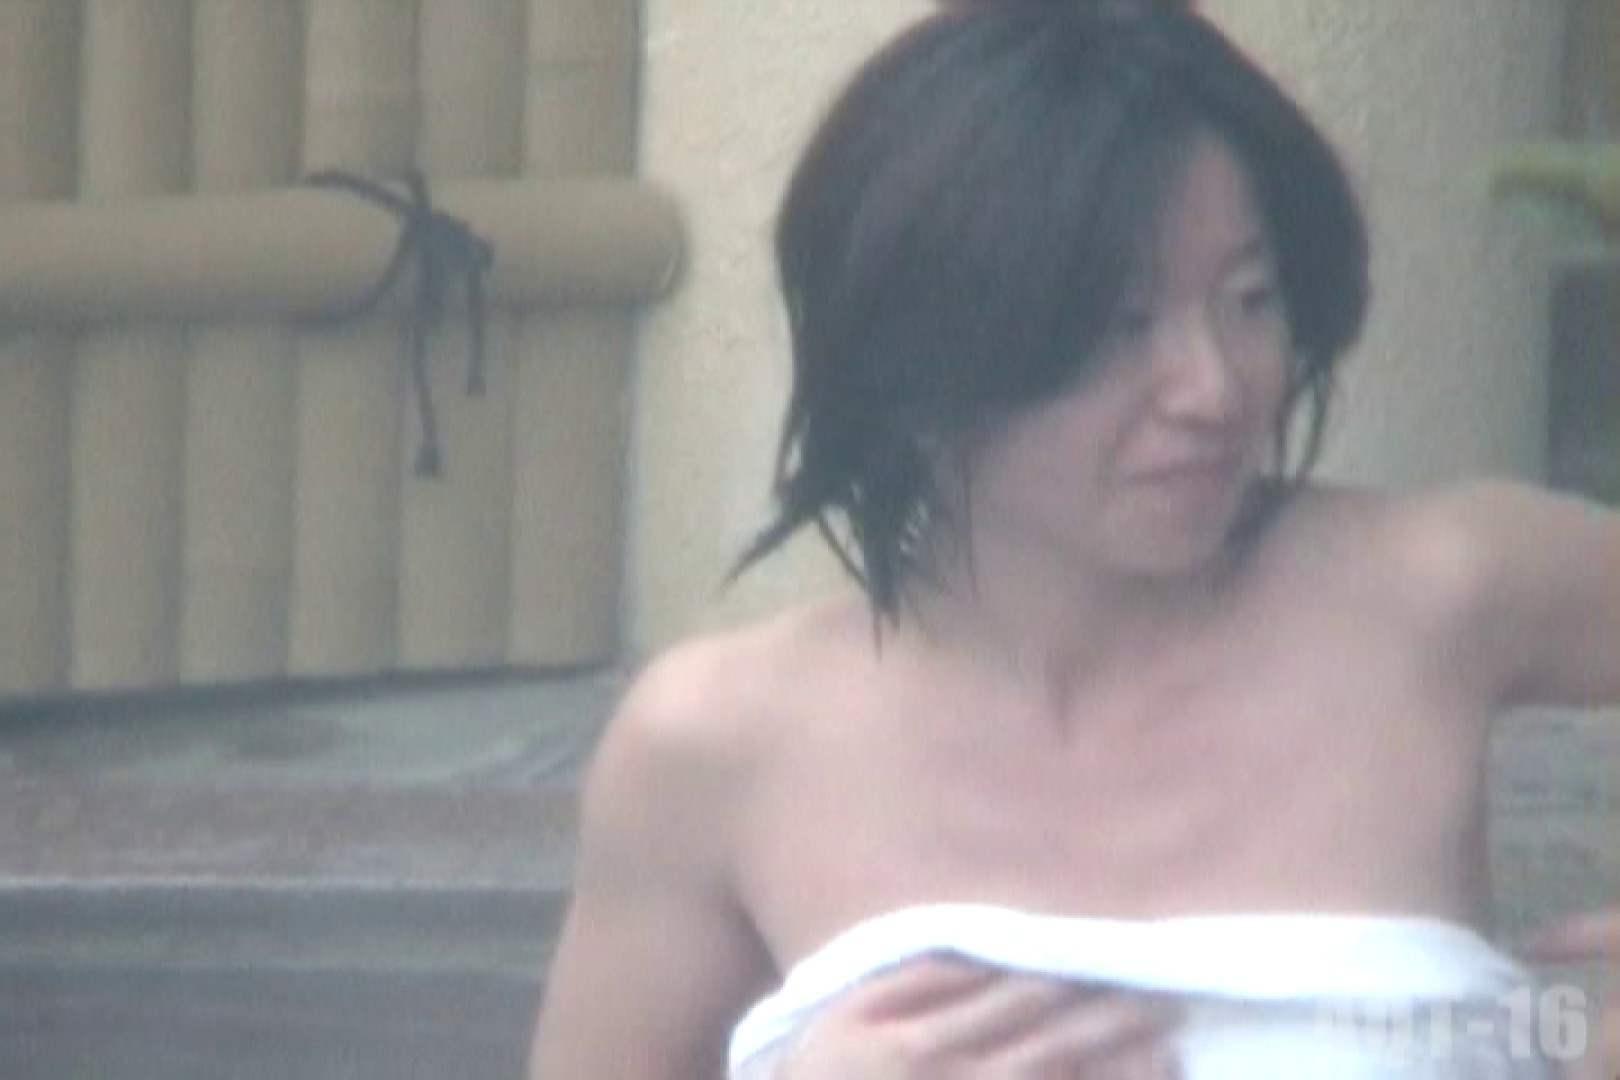 Aquaな露天風呂Vol.841 美しいOLの裸体   露天風呂突入  77pic 16